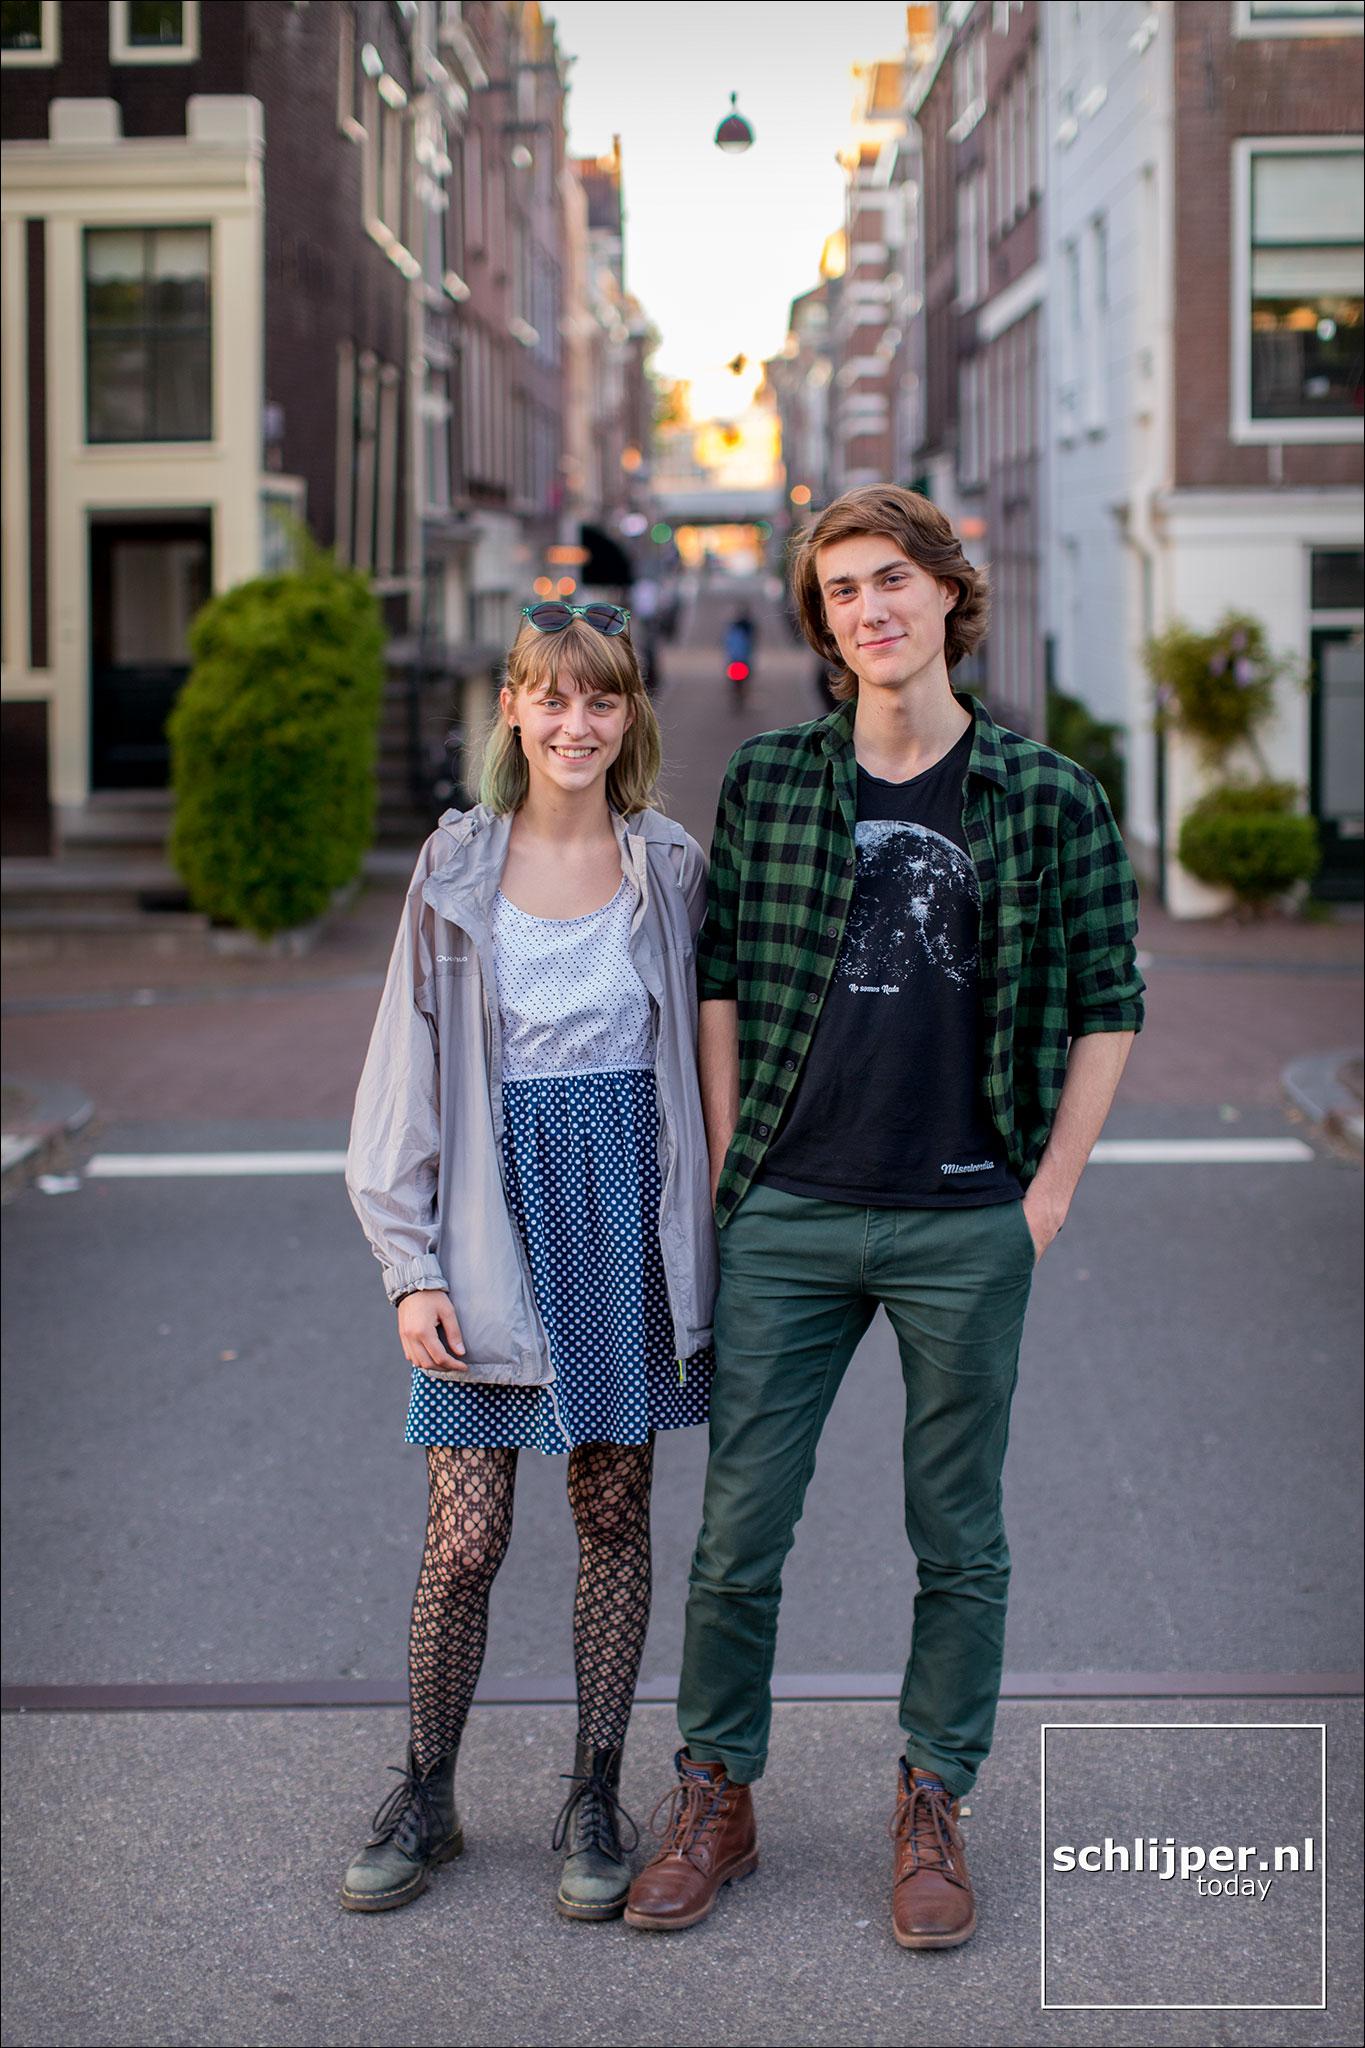 Nederland, Amsterdam, 6 mei 2018